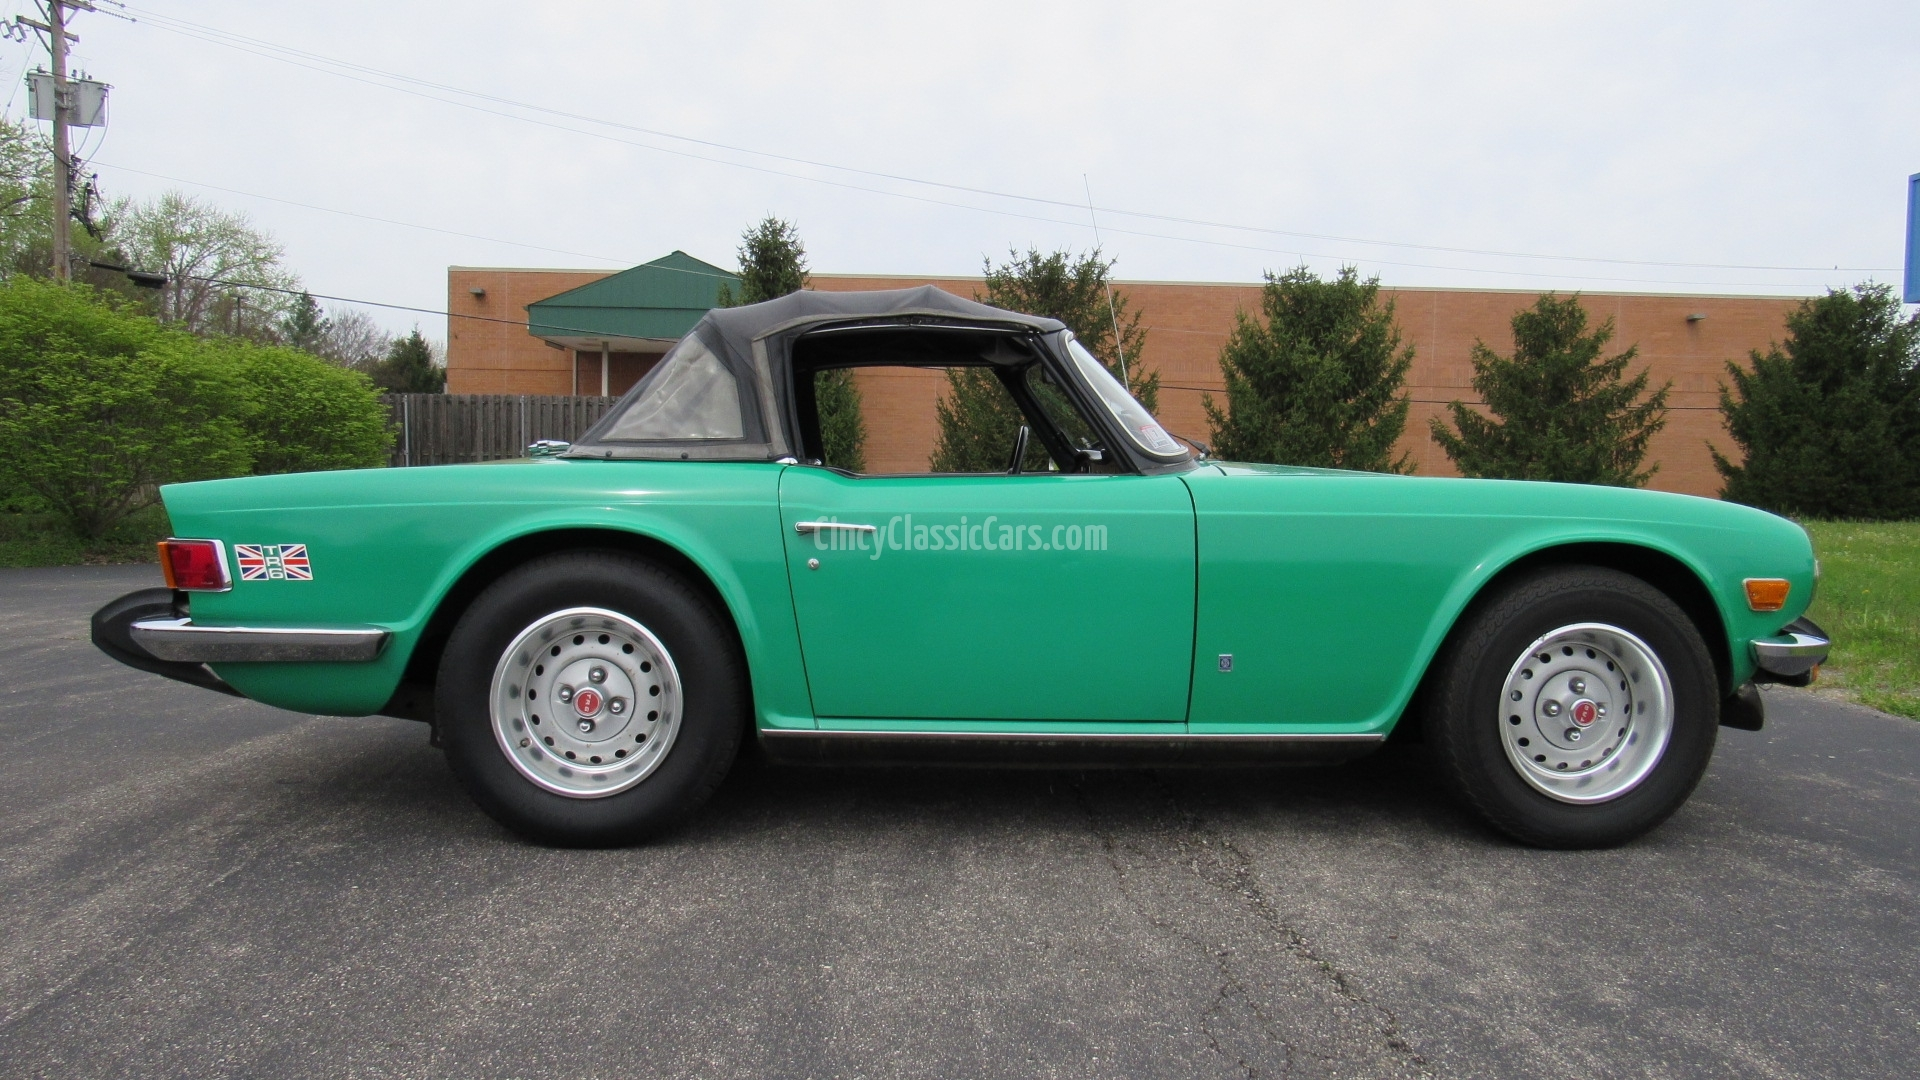 1976 TR6, 32K Miles, Original, Java Green, SOLD!   Cincy Classic Cars